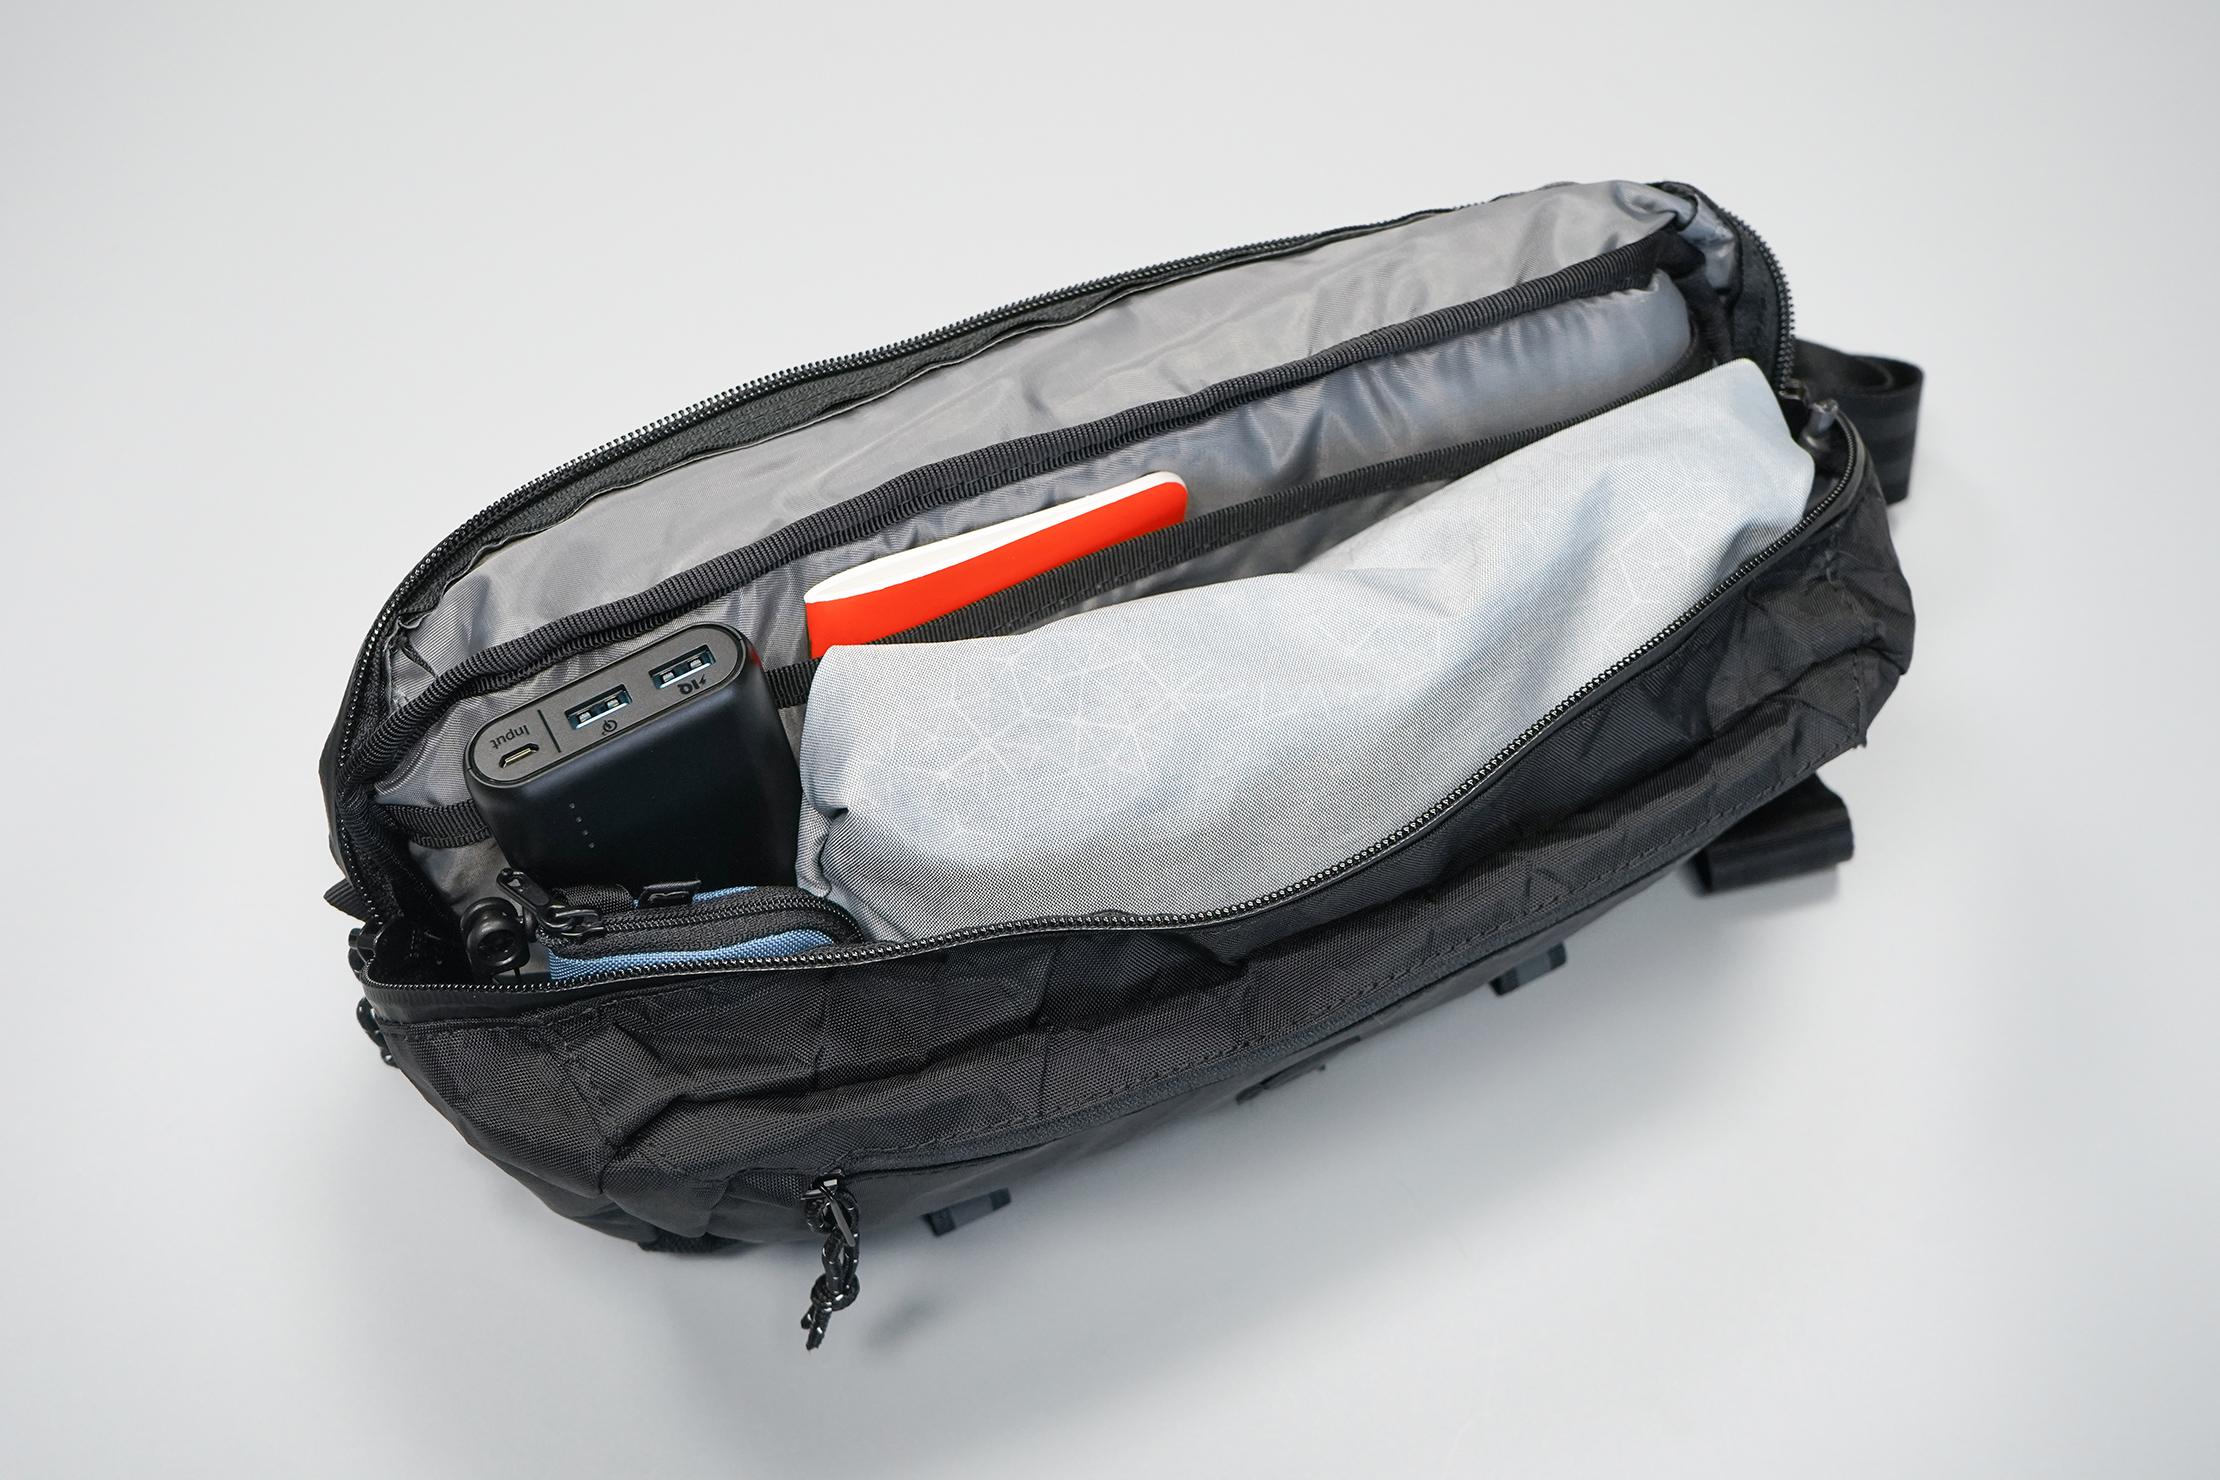 Chrome Industries Mini Kadet | Main compartment